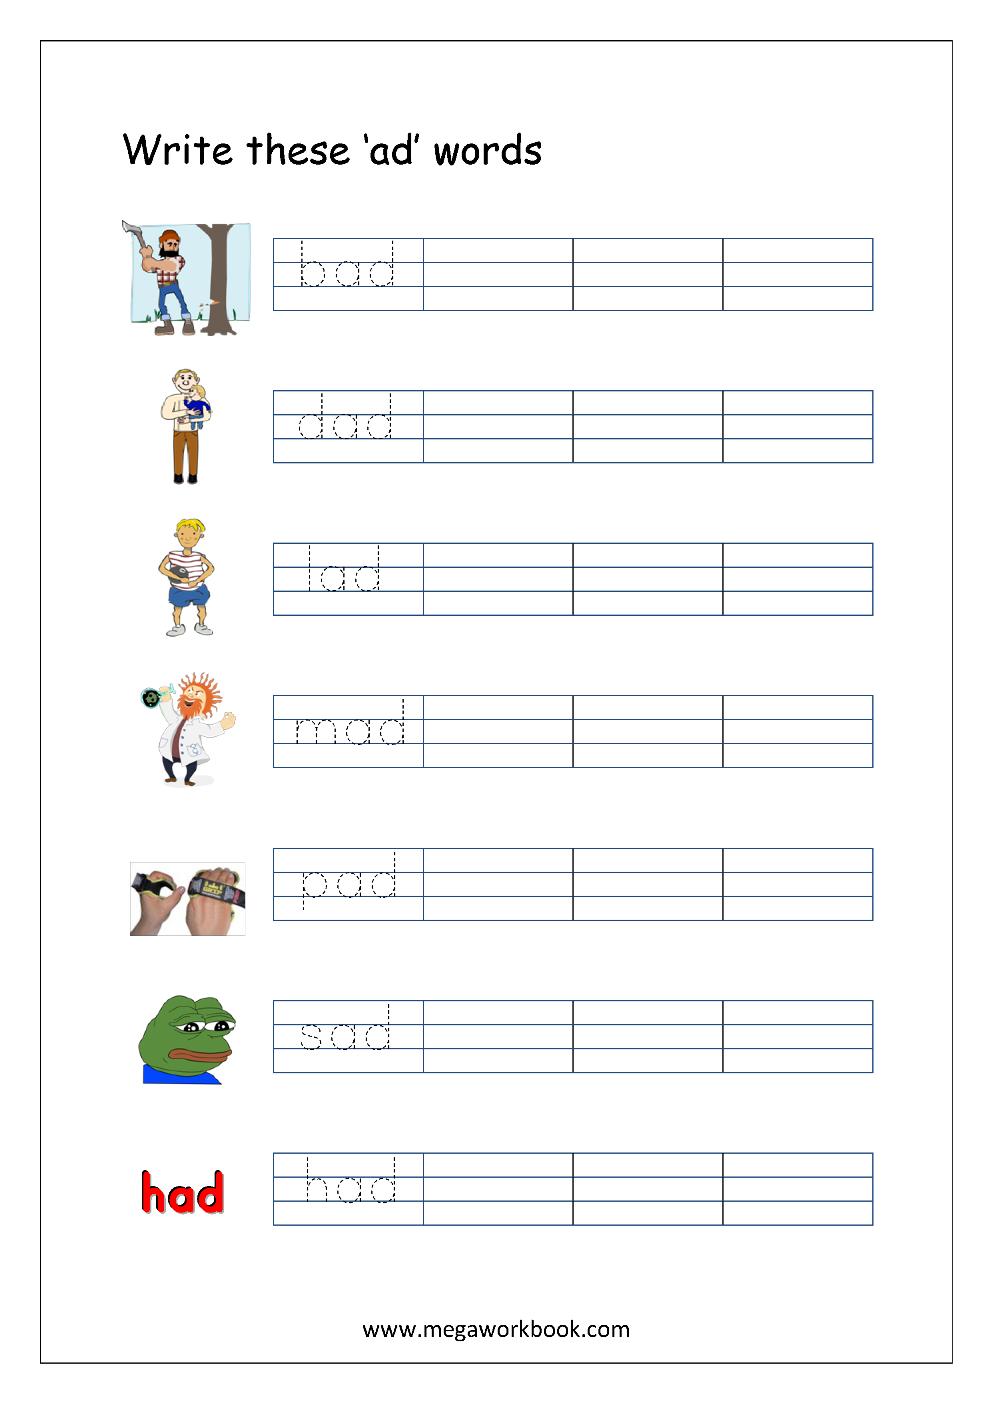 Free Printable Cvc Words Writing Worksheets For Kids - Three Letter | Cvc Words Worksheets Free Printable